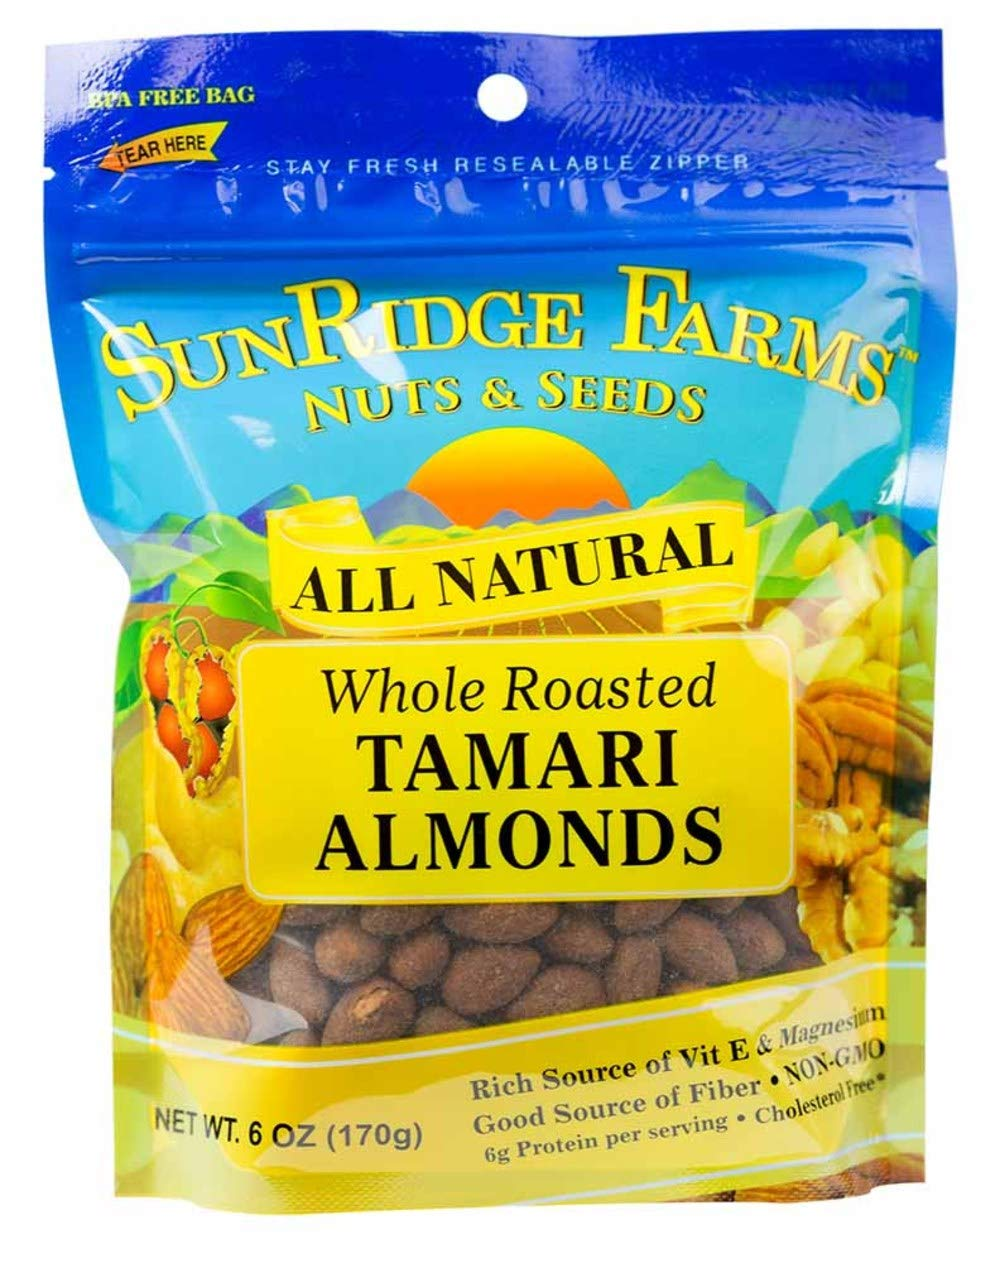 SunRidge Farms Tamari Roasted Almonds, 6 Ounce Bag (Pack of 12)